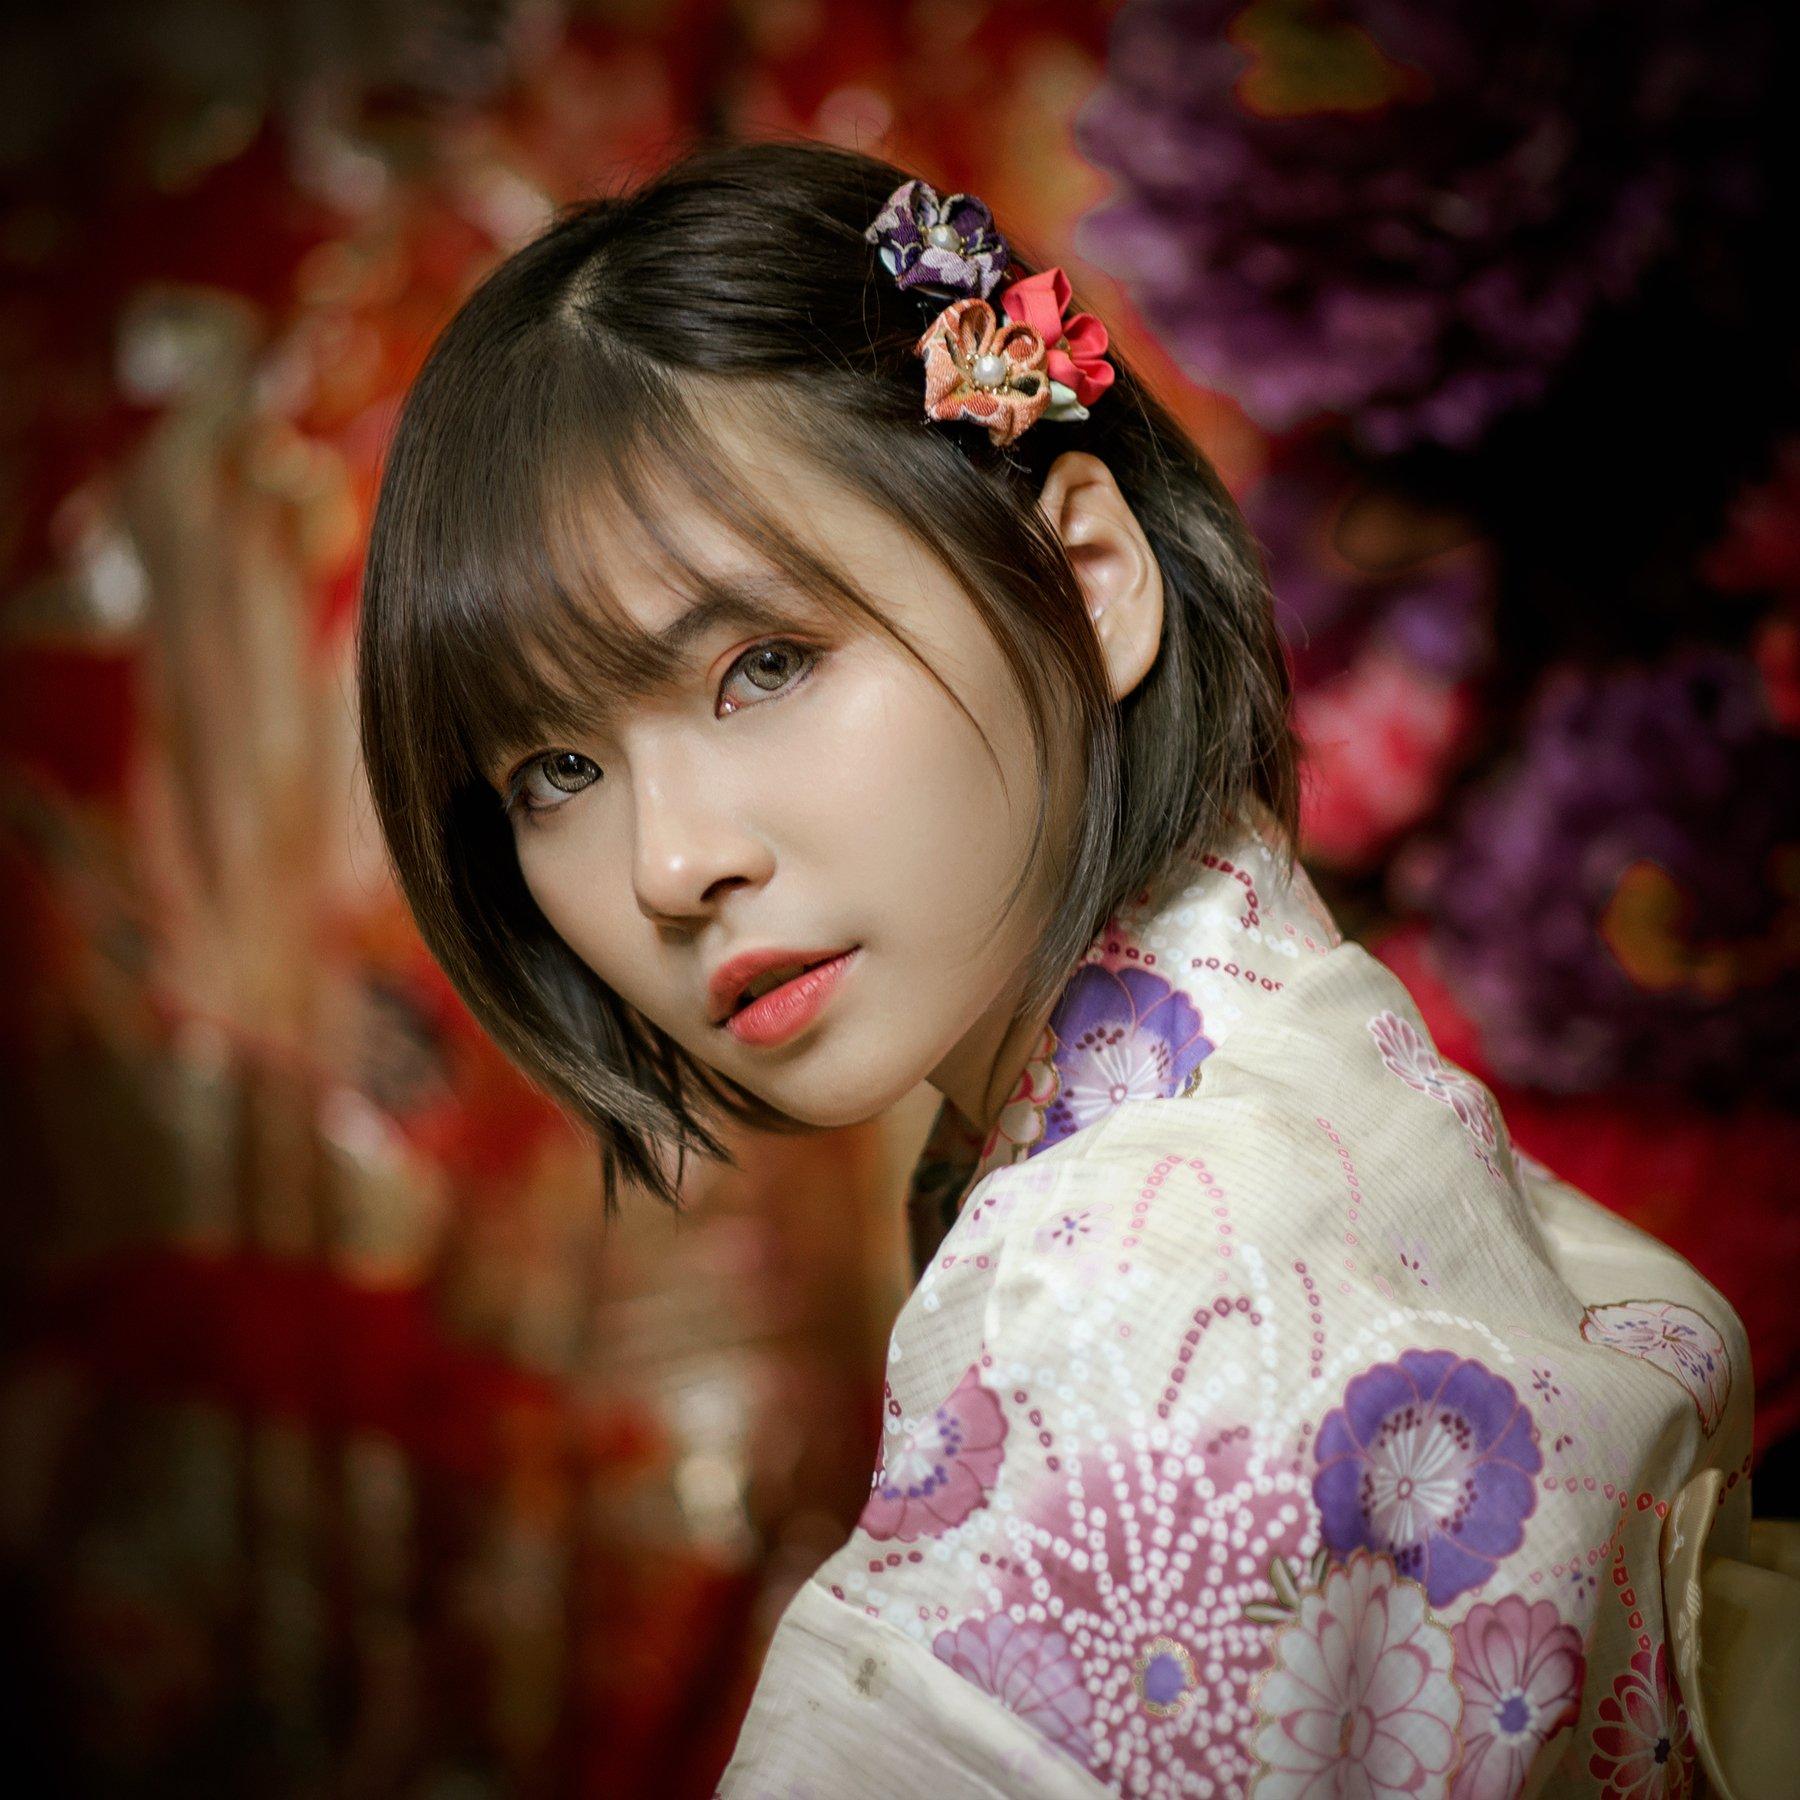 people, portrait, girl, asian, vietnam, vietnamese, face, young, beauty, glamour, eyes, Hoang Viet Nguyen